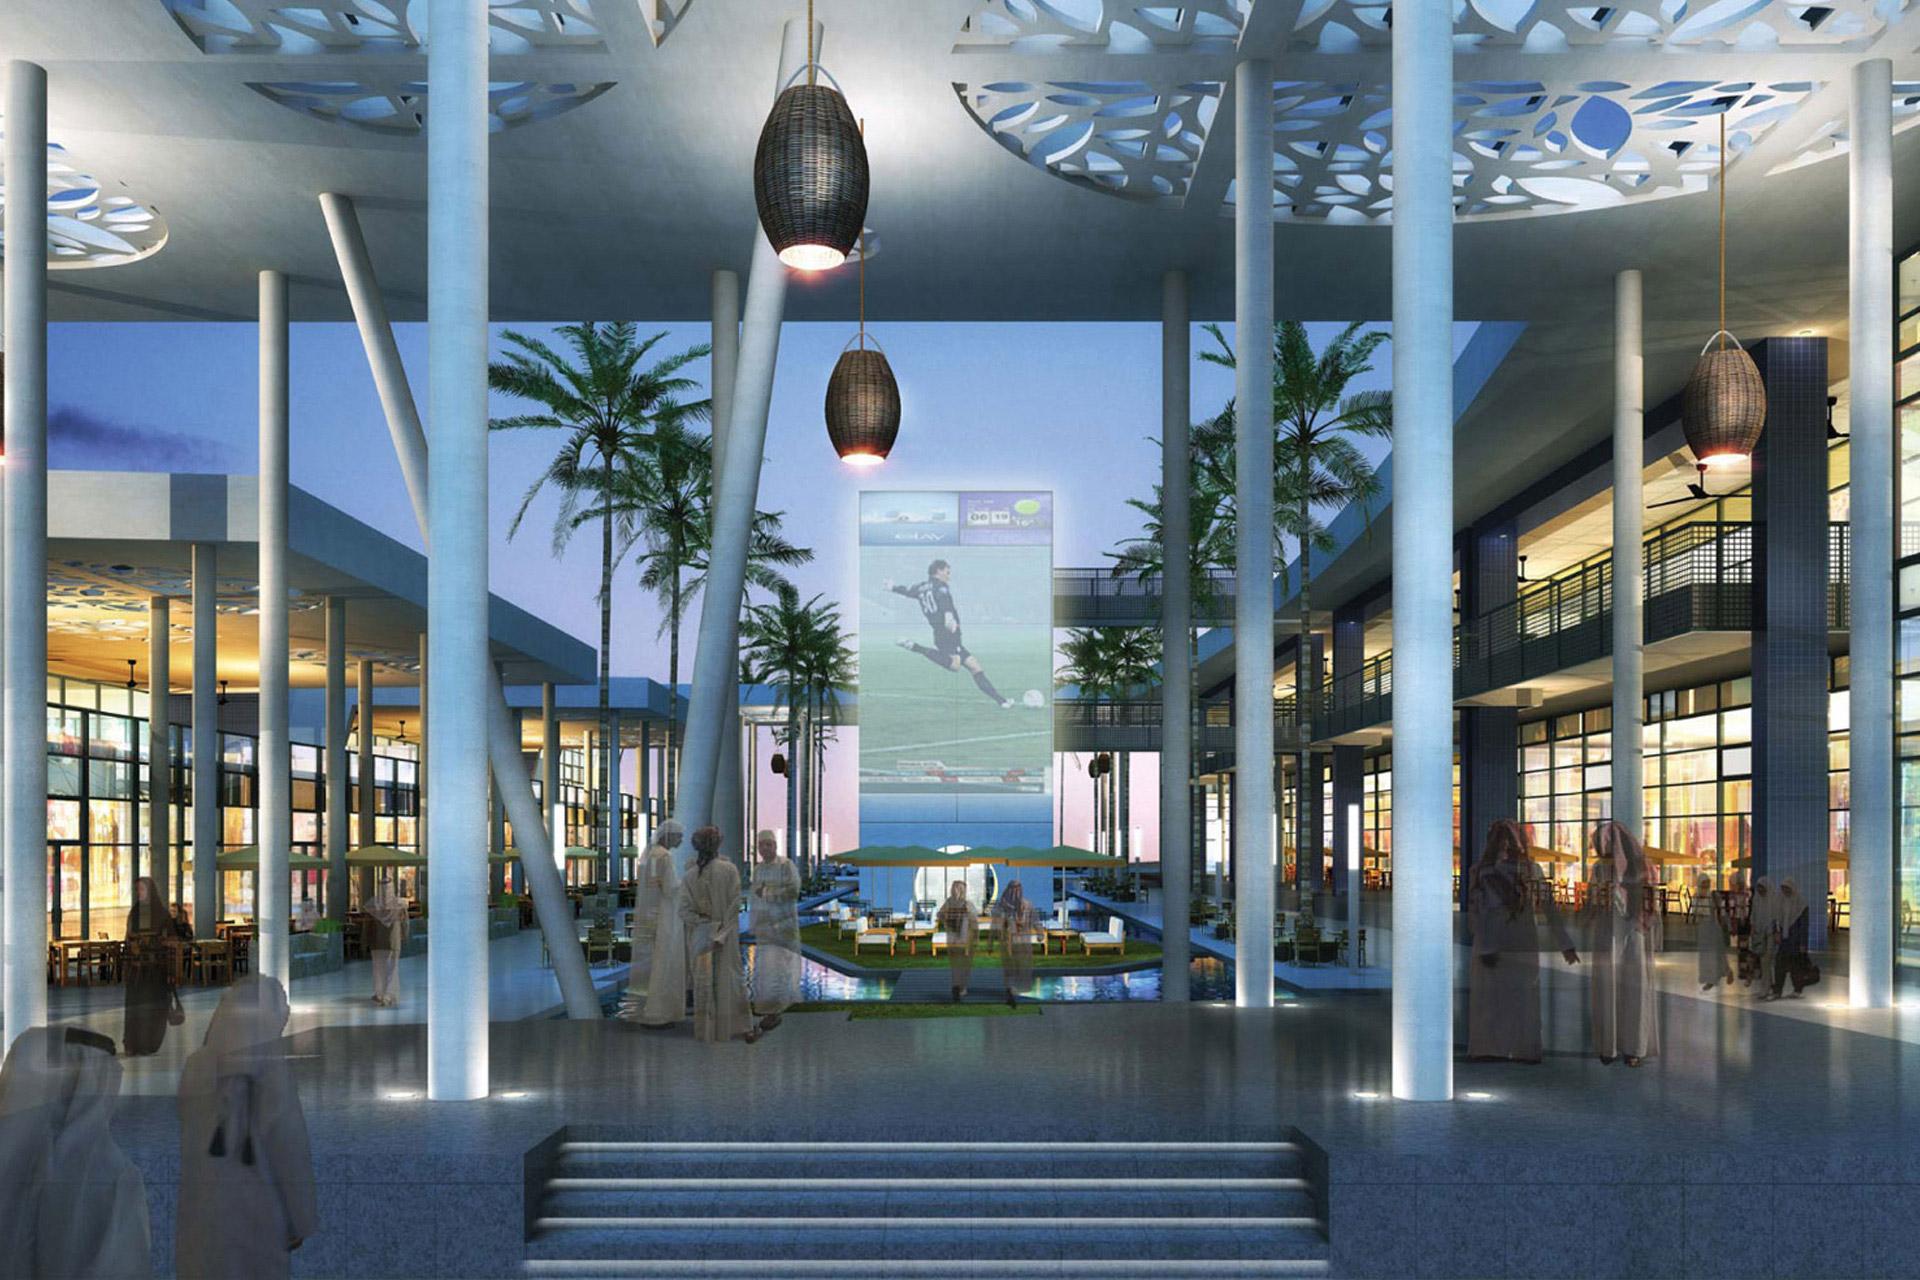 Taawon Mall decor